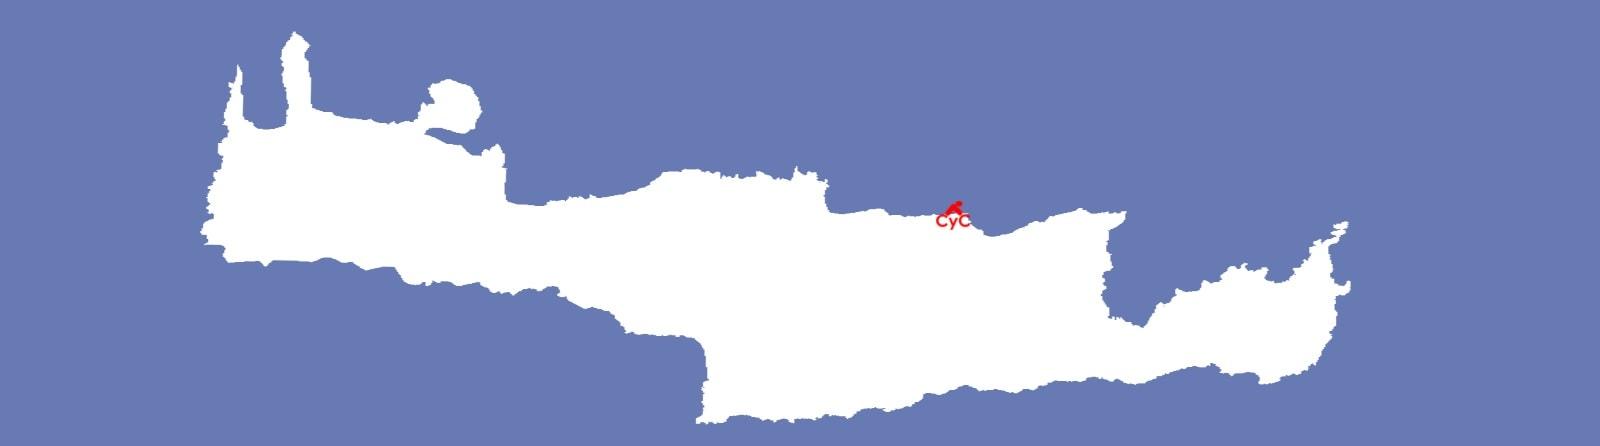 cycling creta on the cretan map